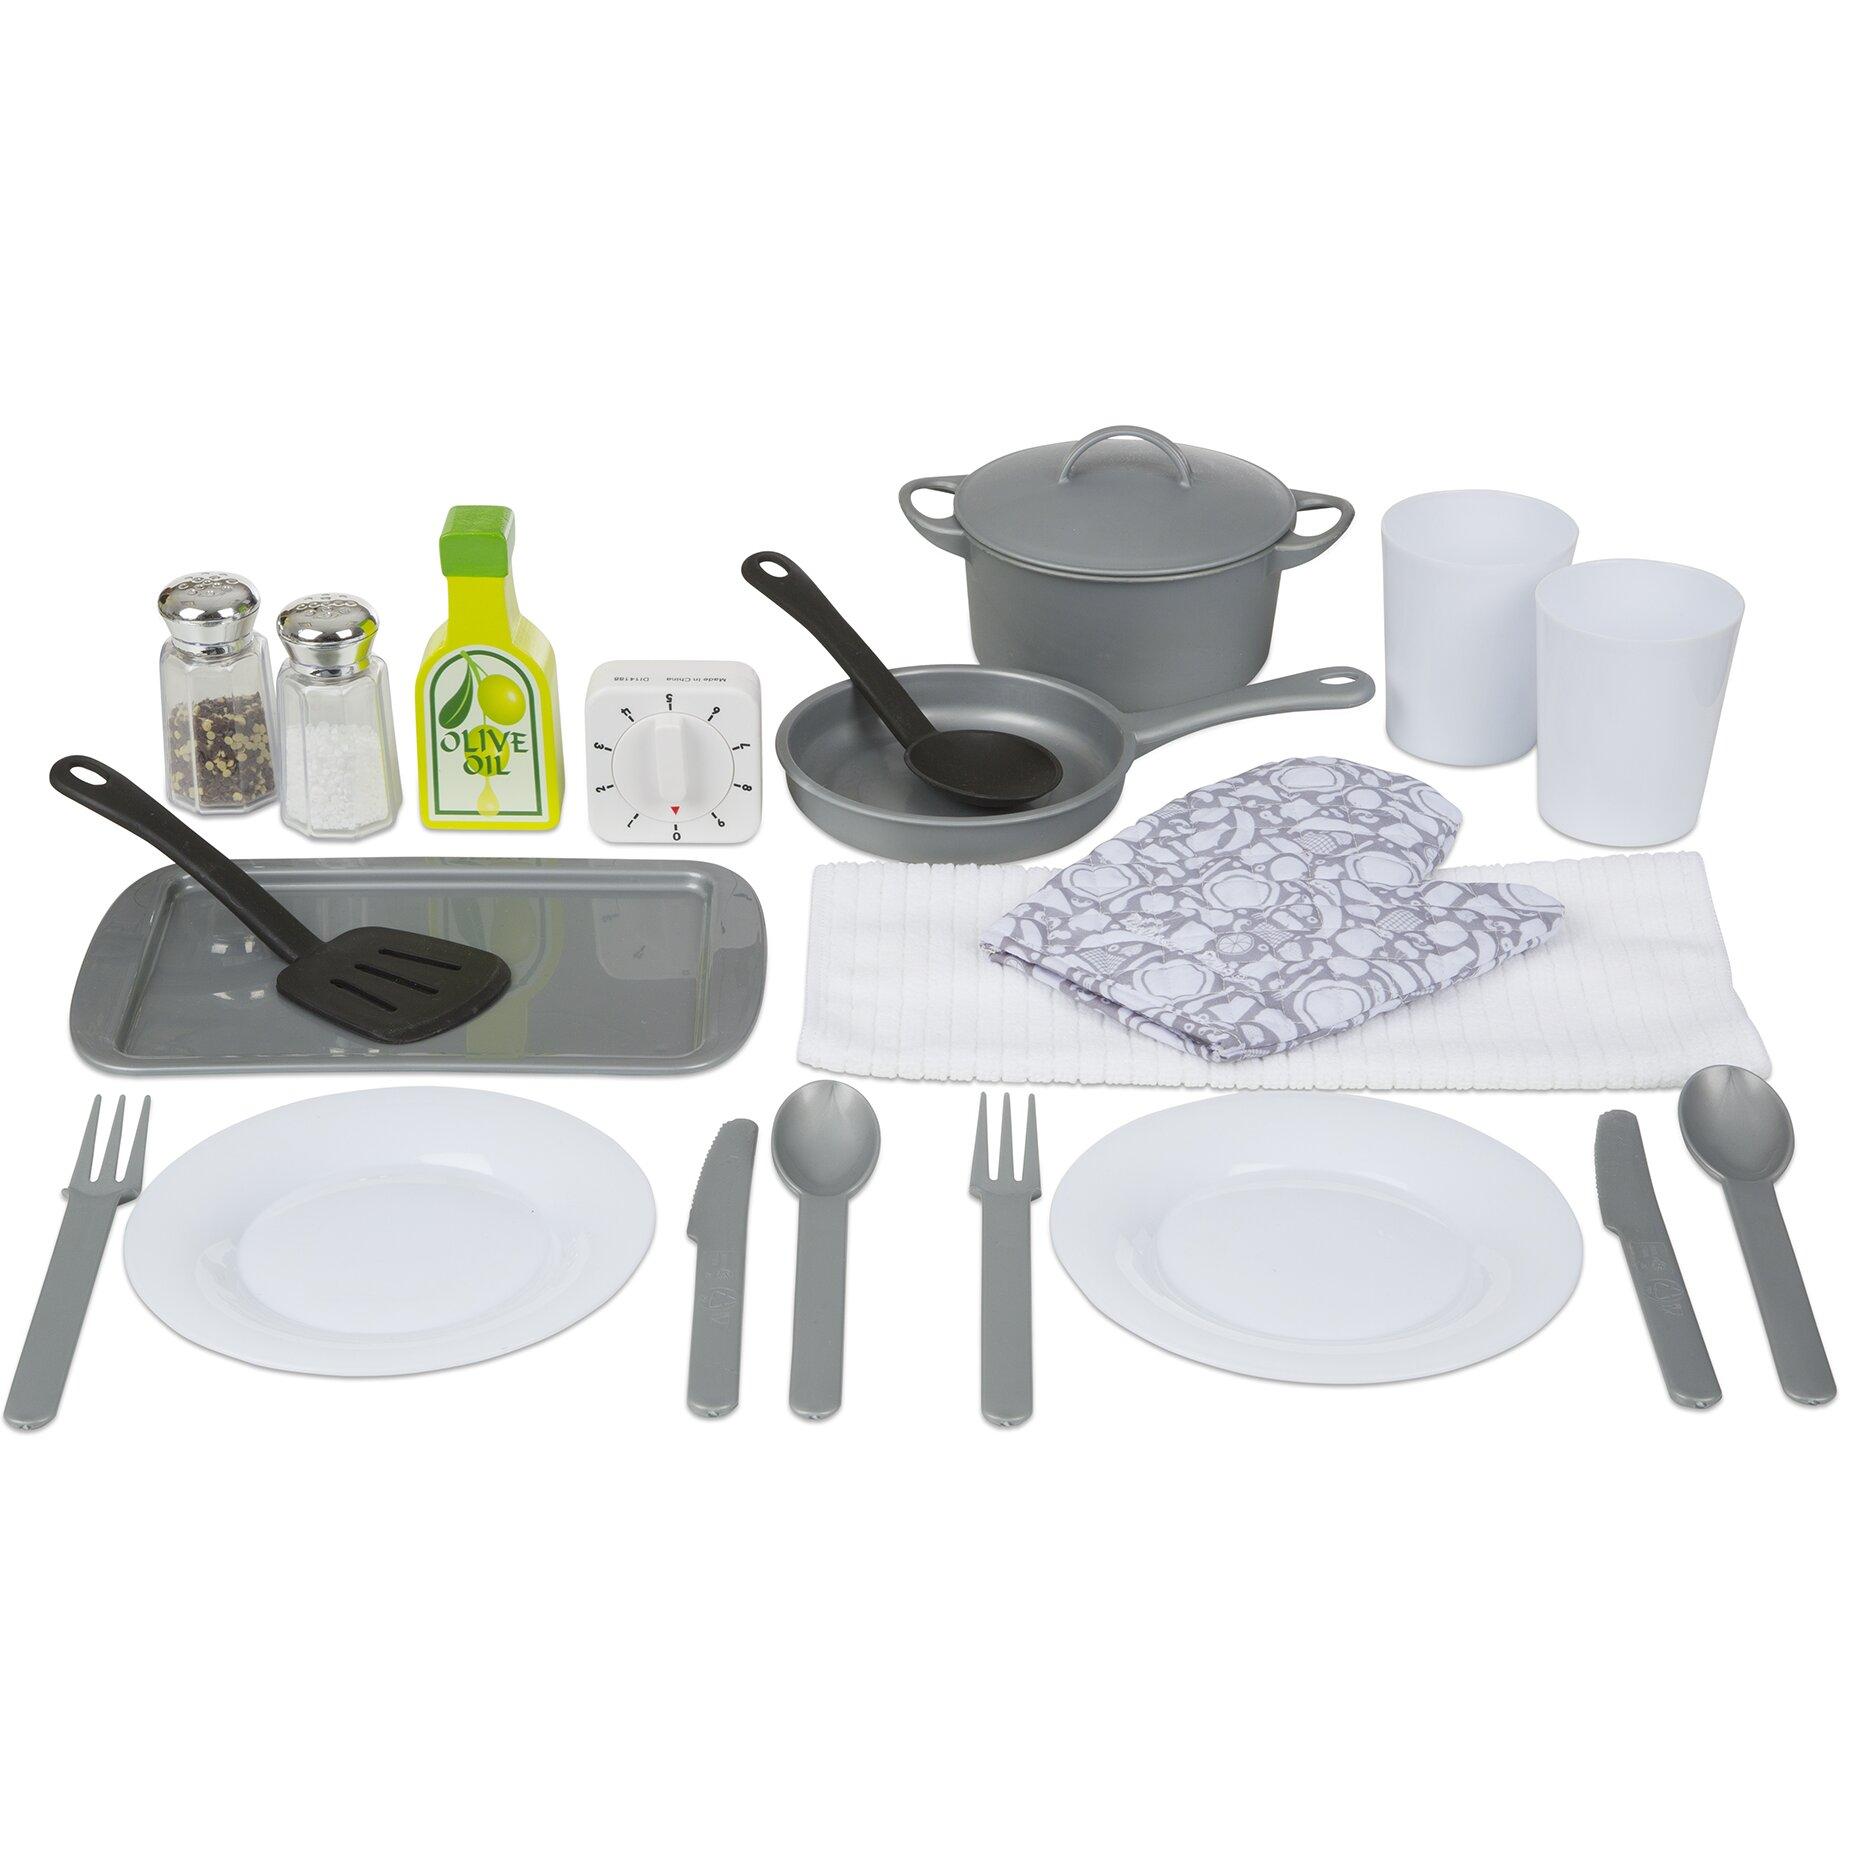 doug 20 kitchen accessory set reviews